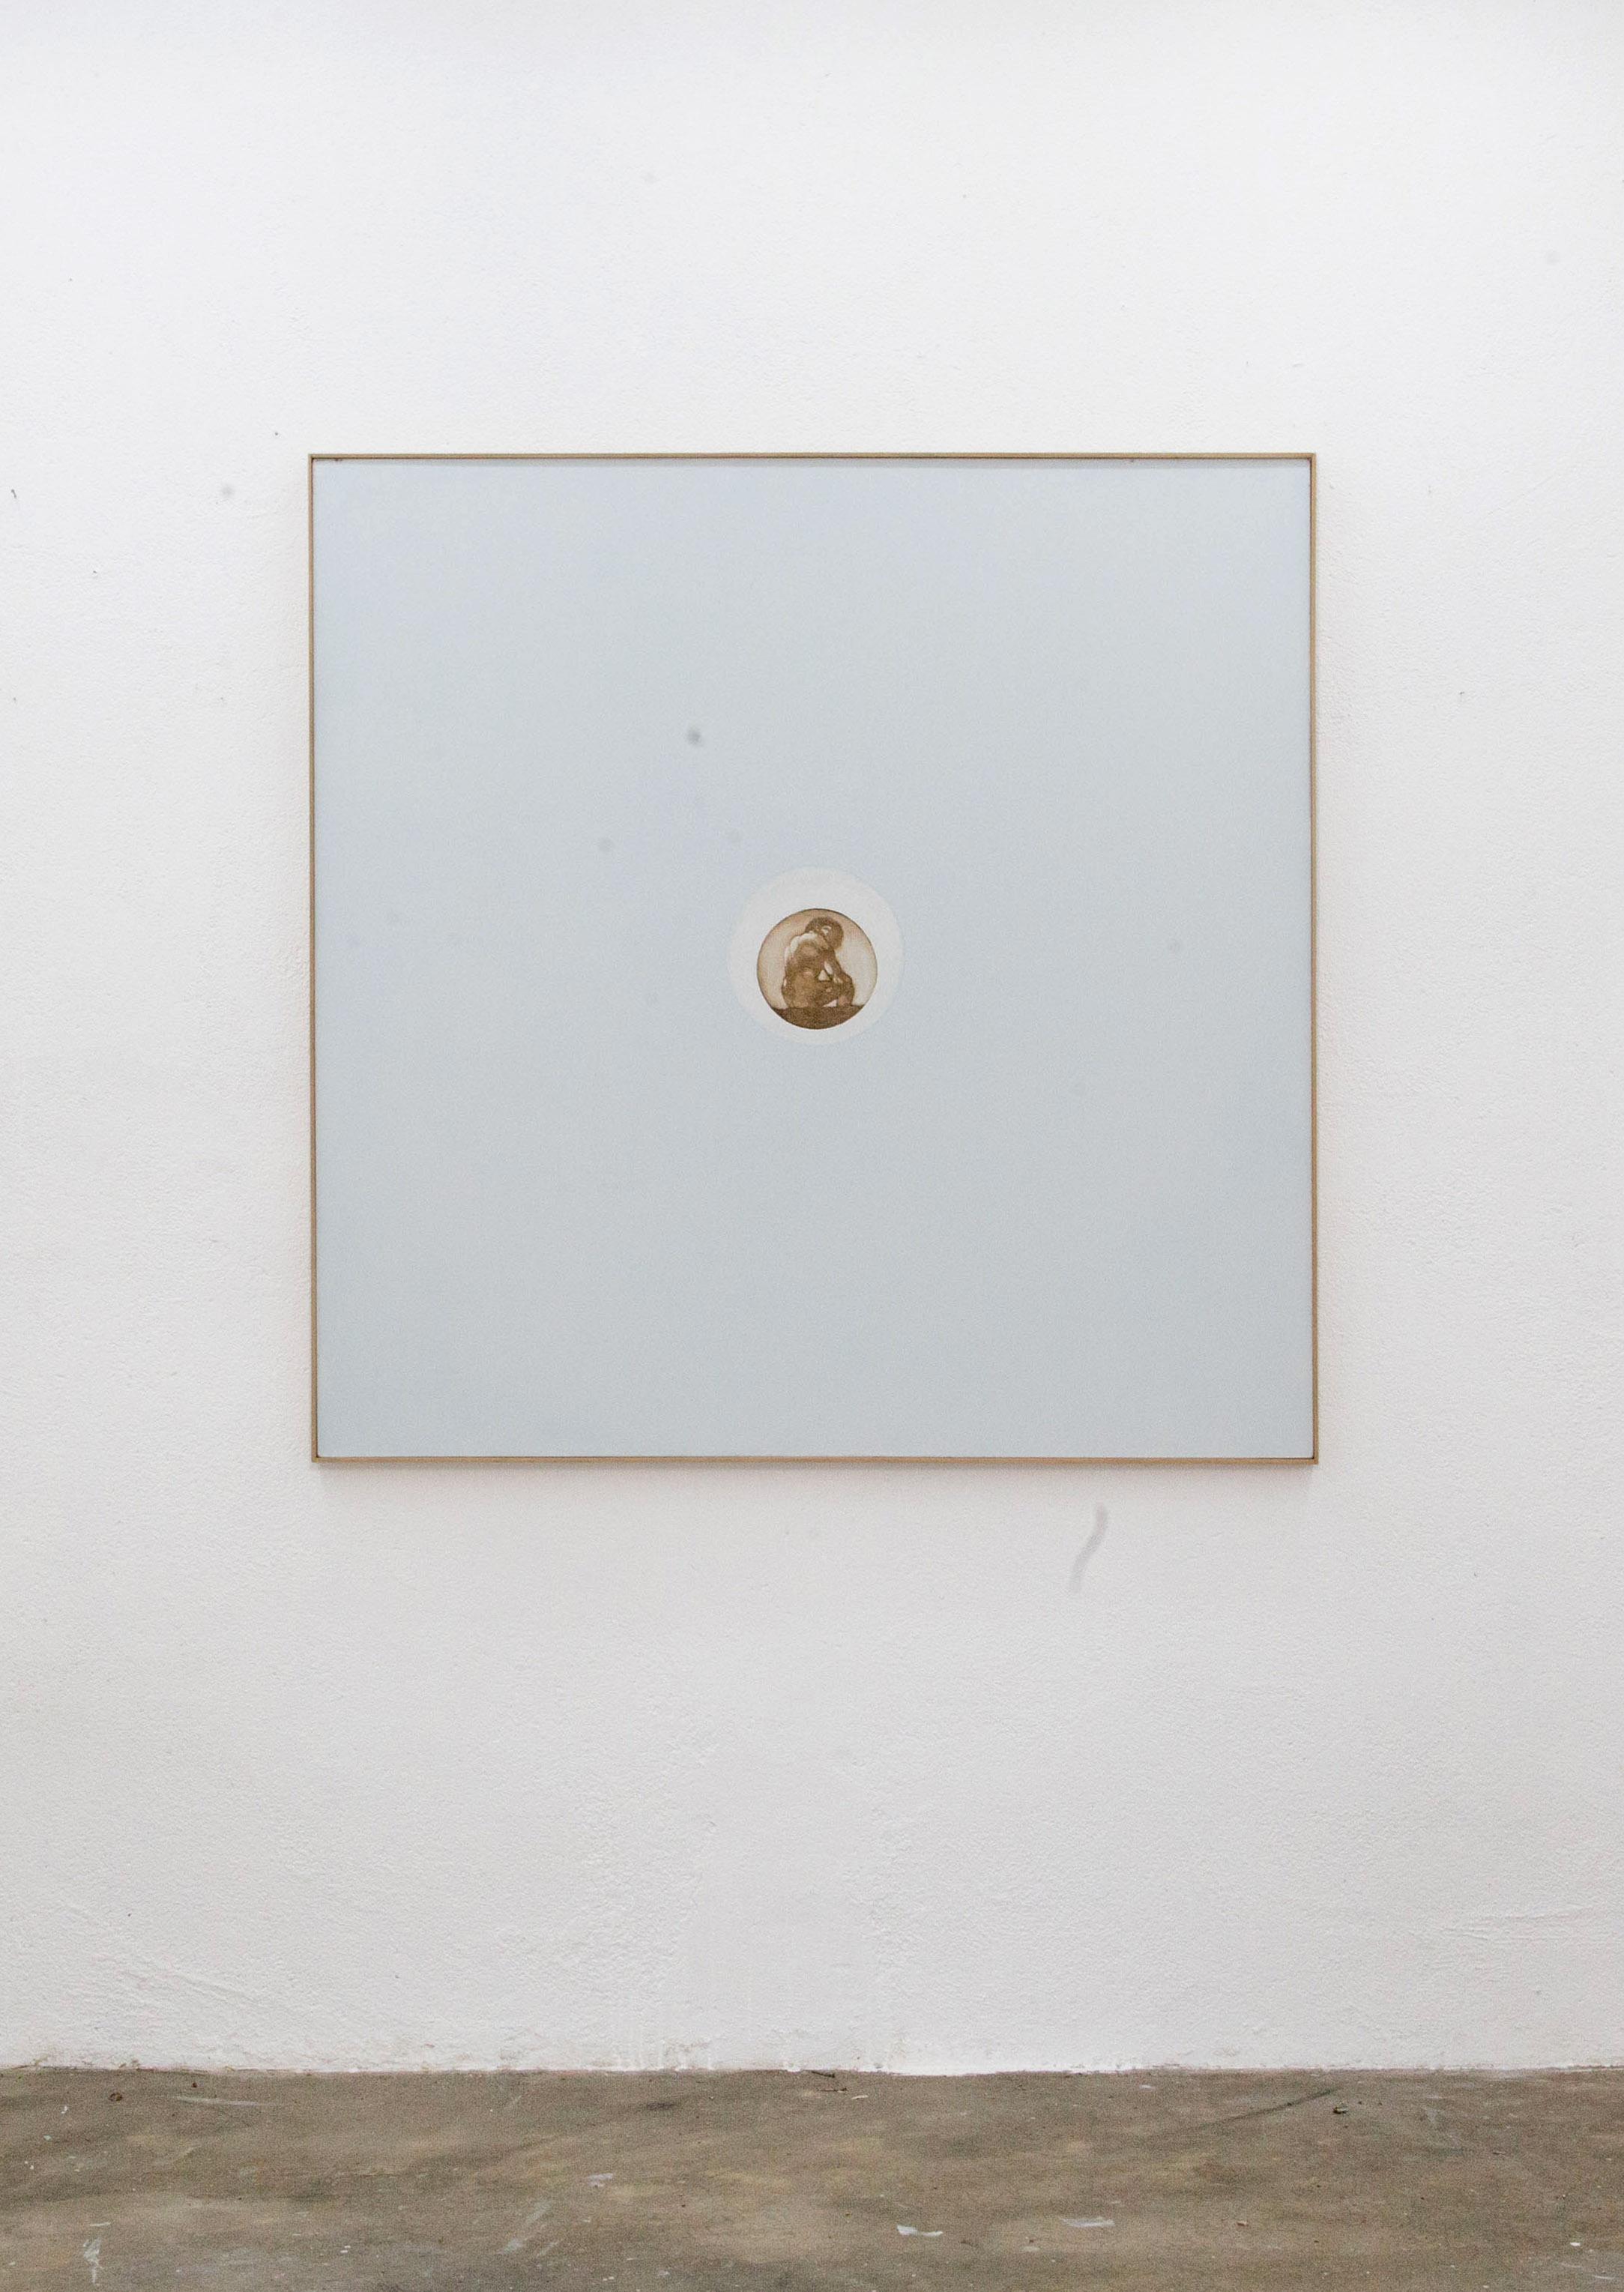 Renato RiosGoya, 2017óleo sobre tela 120 x 120 cm